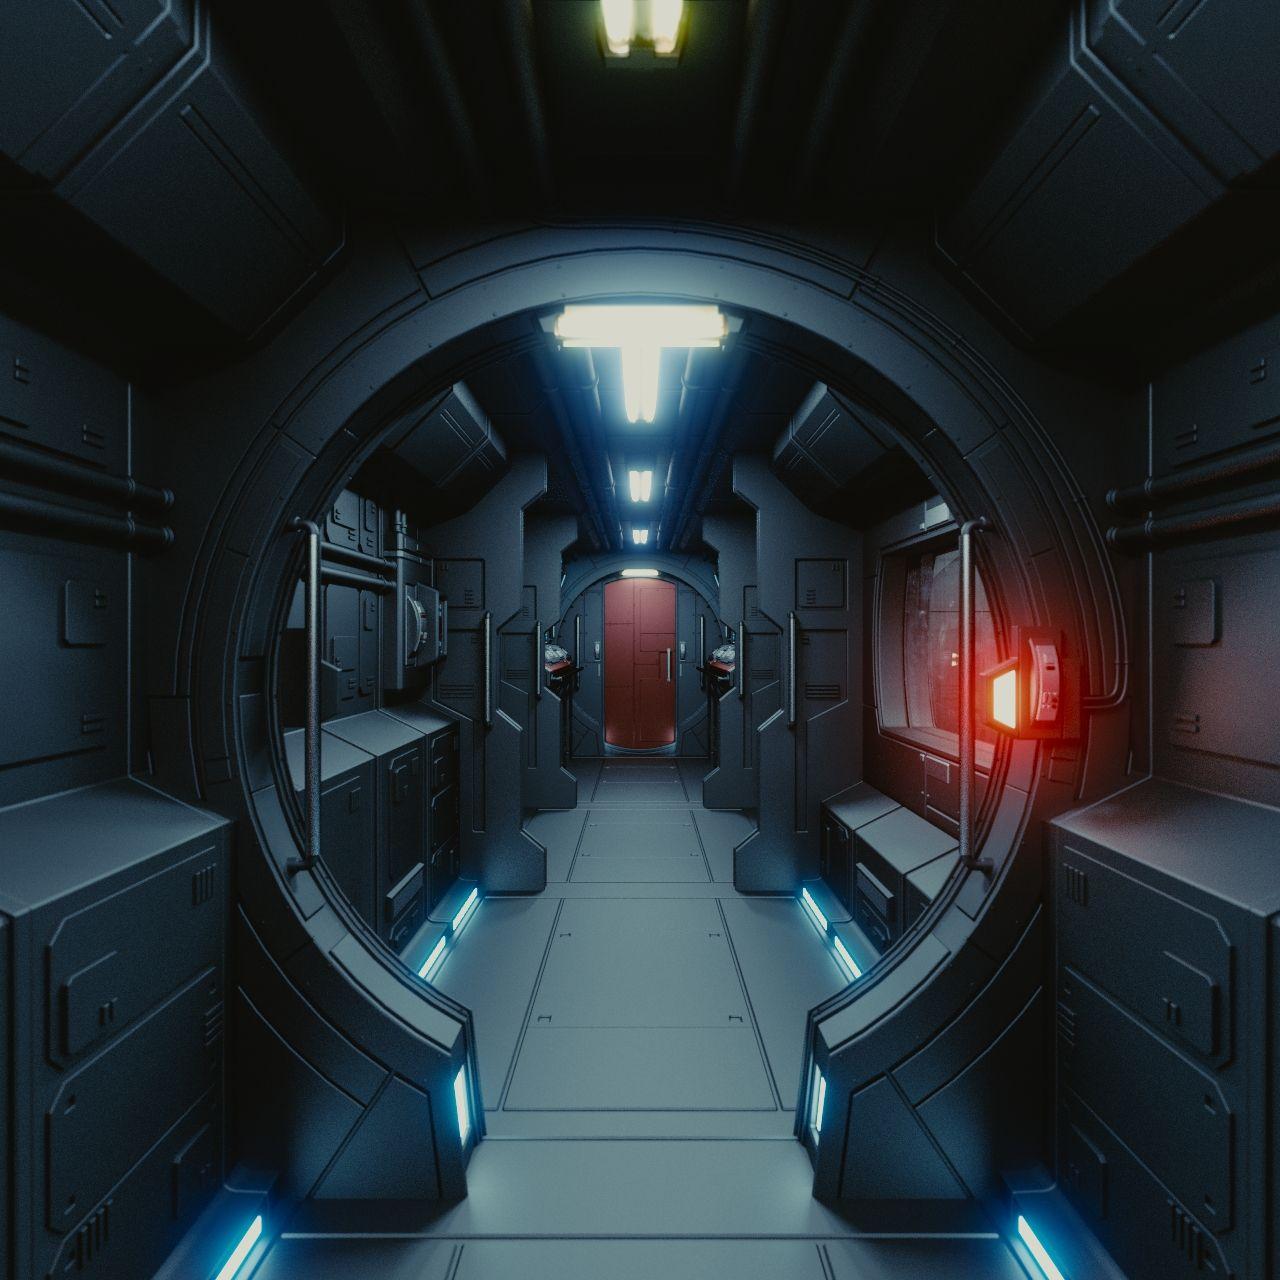 Dan brown cgi sci fi art concept art spaceship for Sci fi decor